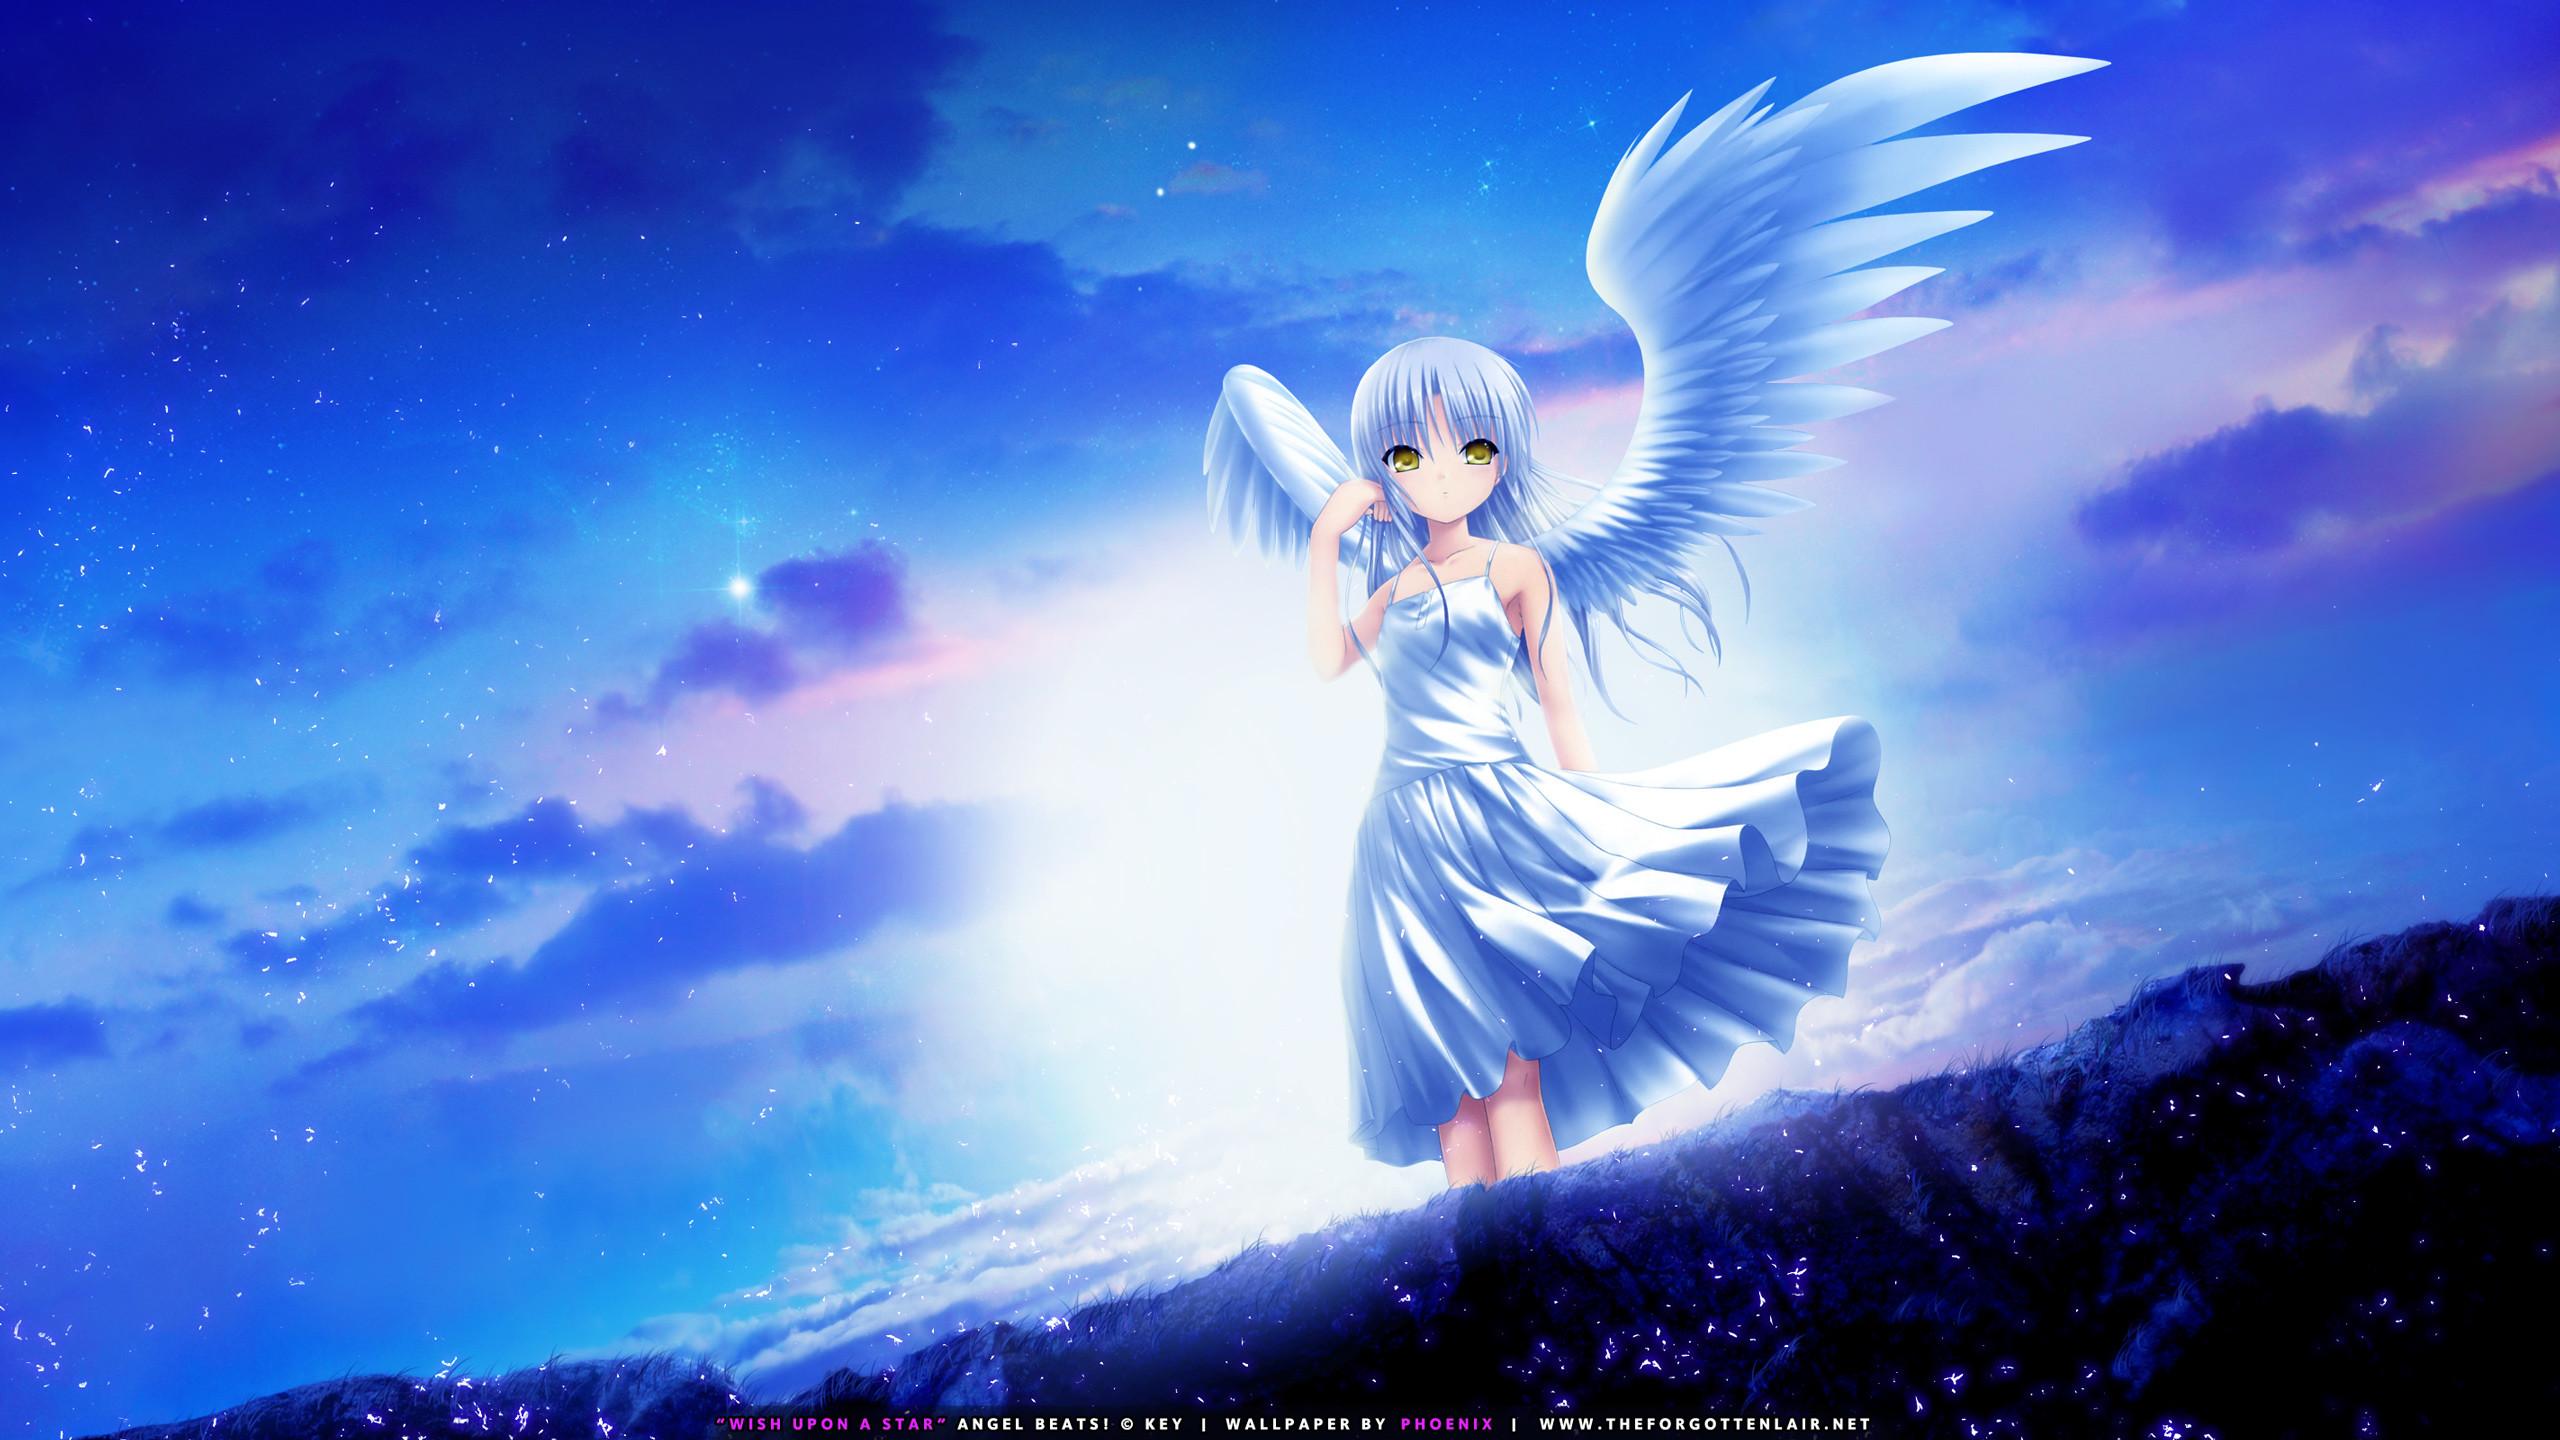 1920x1200 Full Hd Anime Cupid Angel Wallpaper Desktop